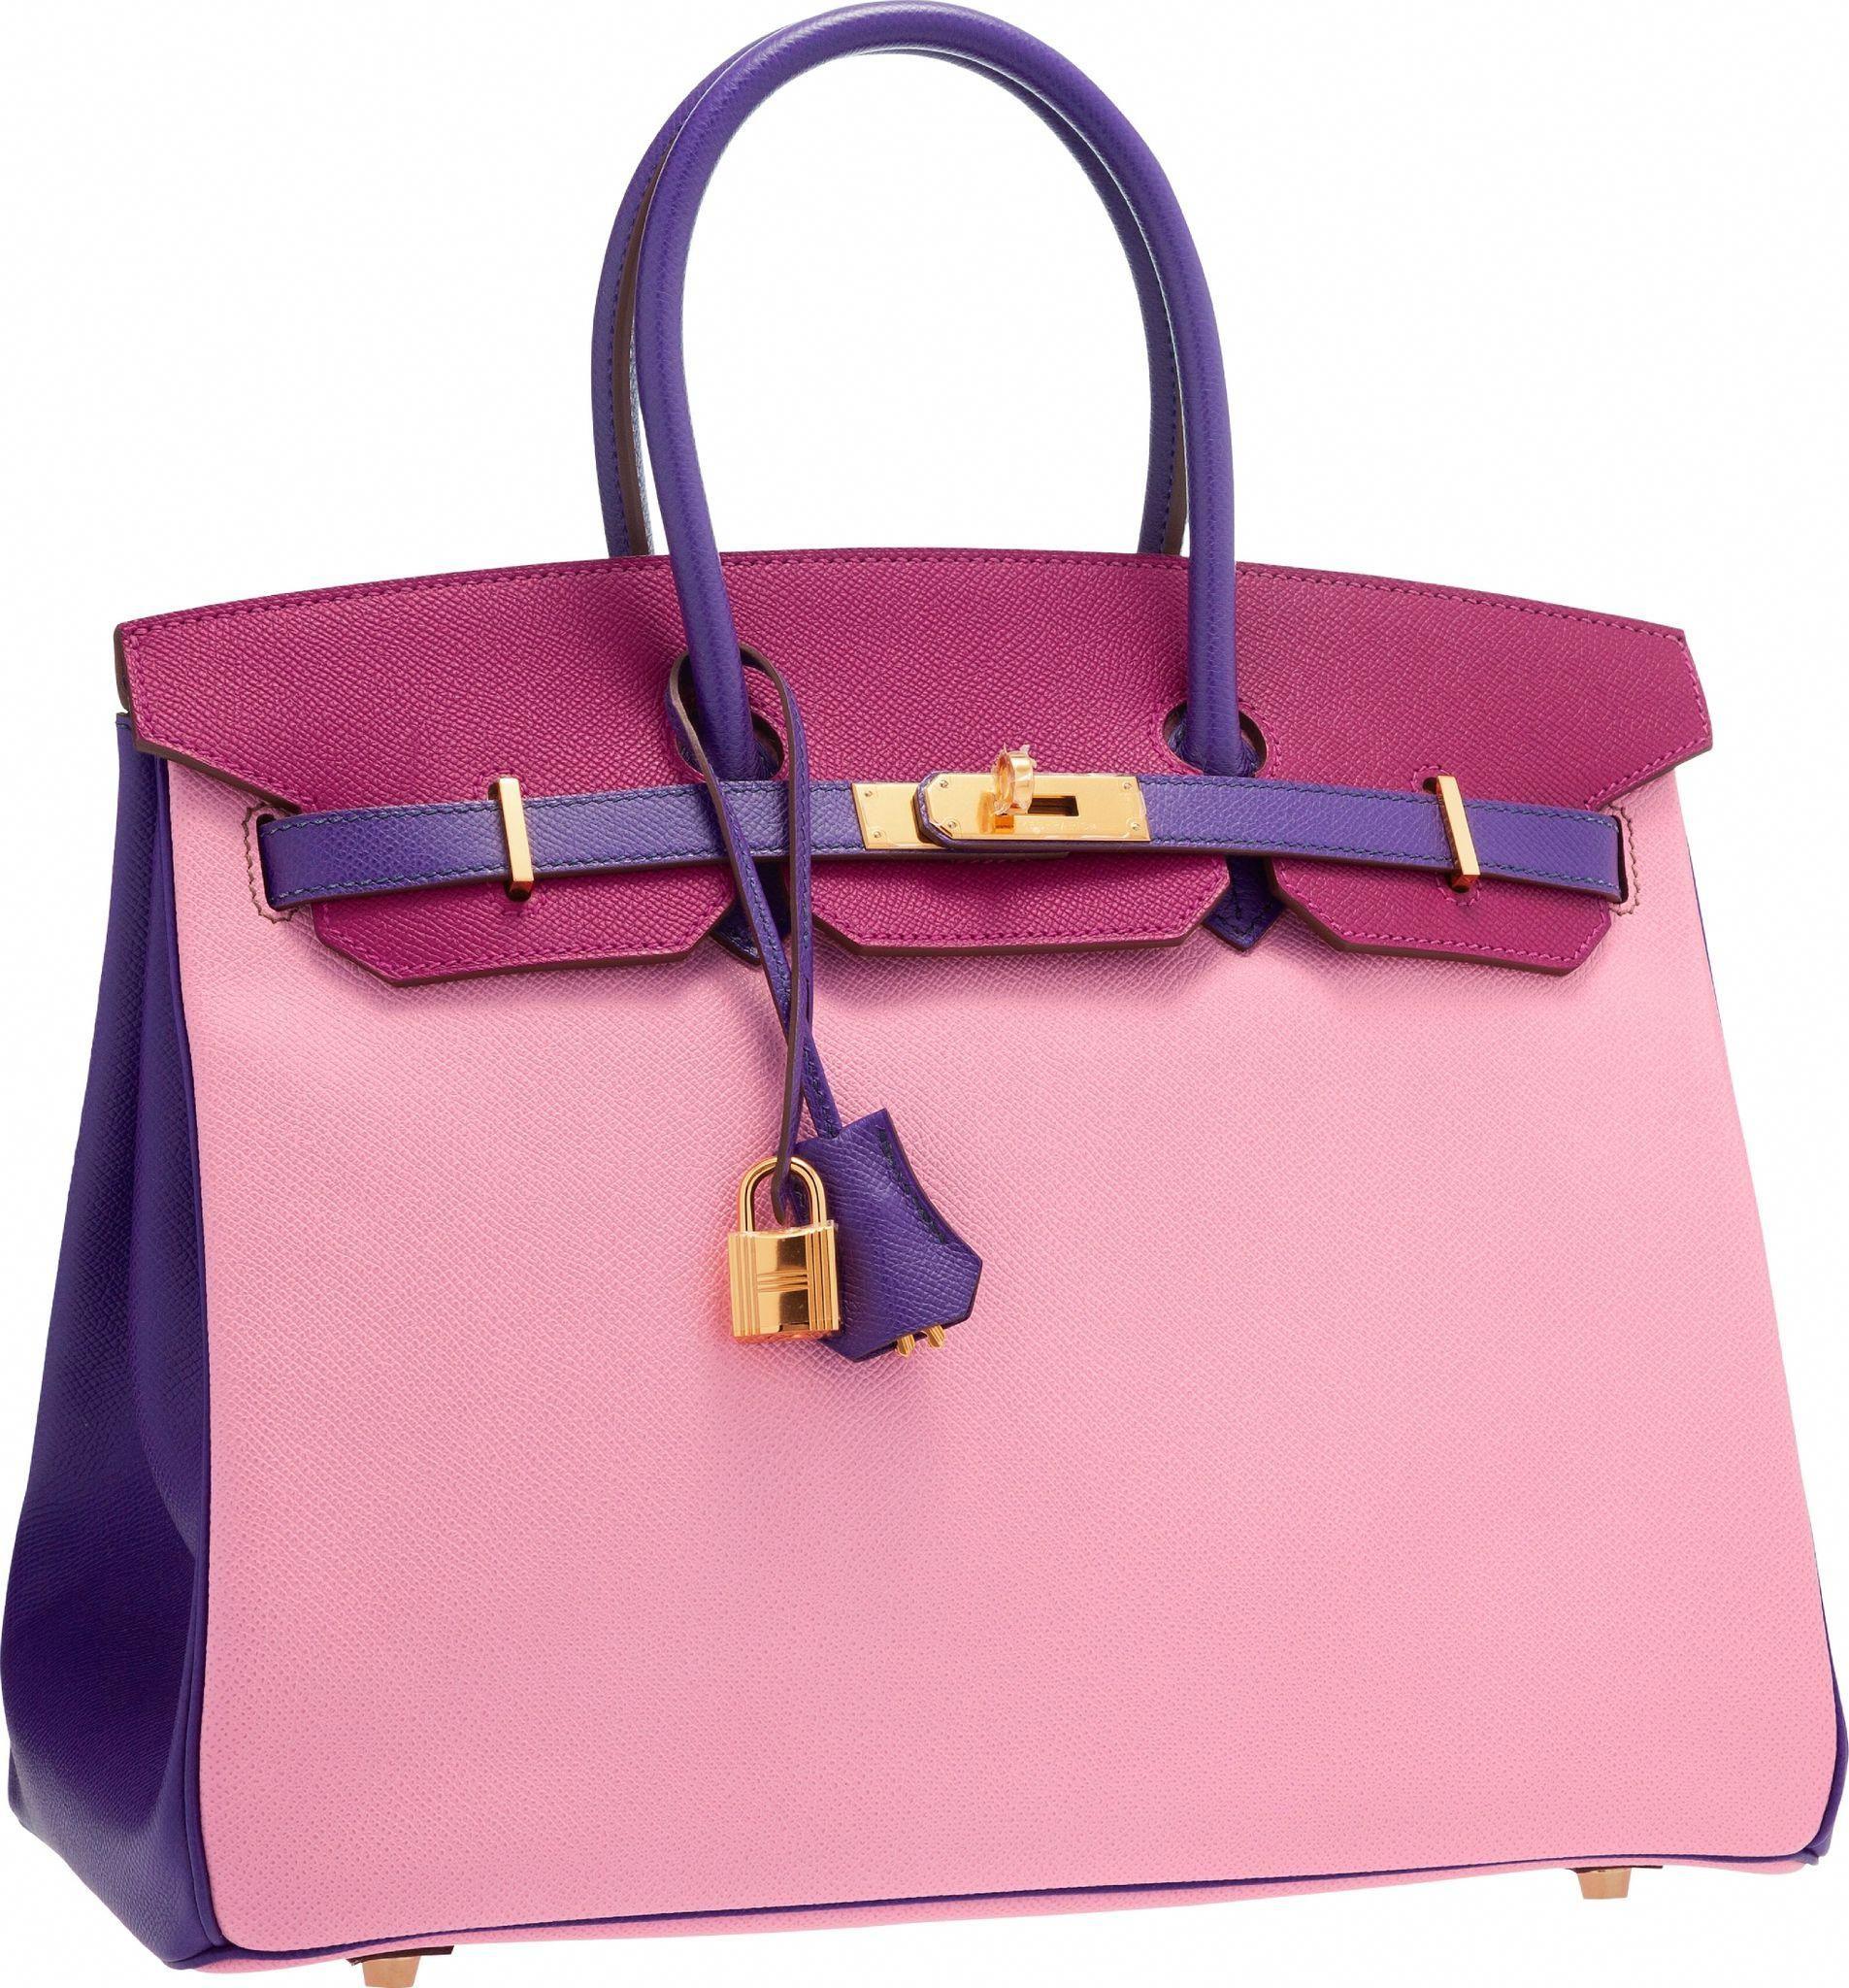 d1394fe62b1 Hermès Special Order Horseshoe 30cm Rose Tyrien, Blue Hydra & Parme Chevre Leather  Birkin Bag with Gold Hardware.   Twerking For Birkins in 2019   Hermes ...